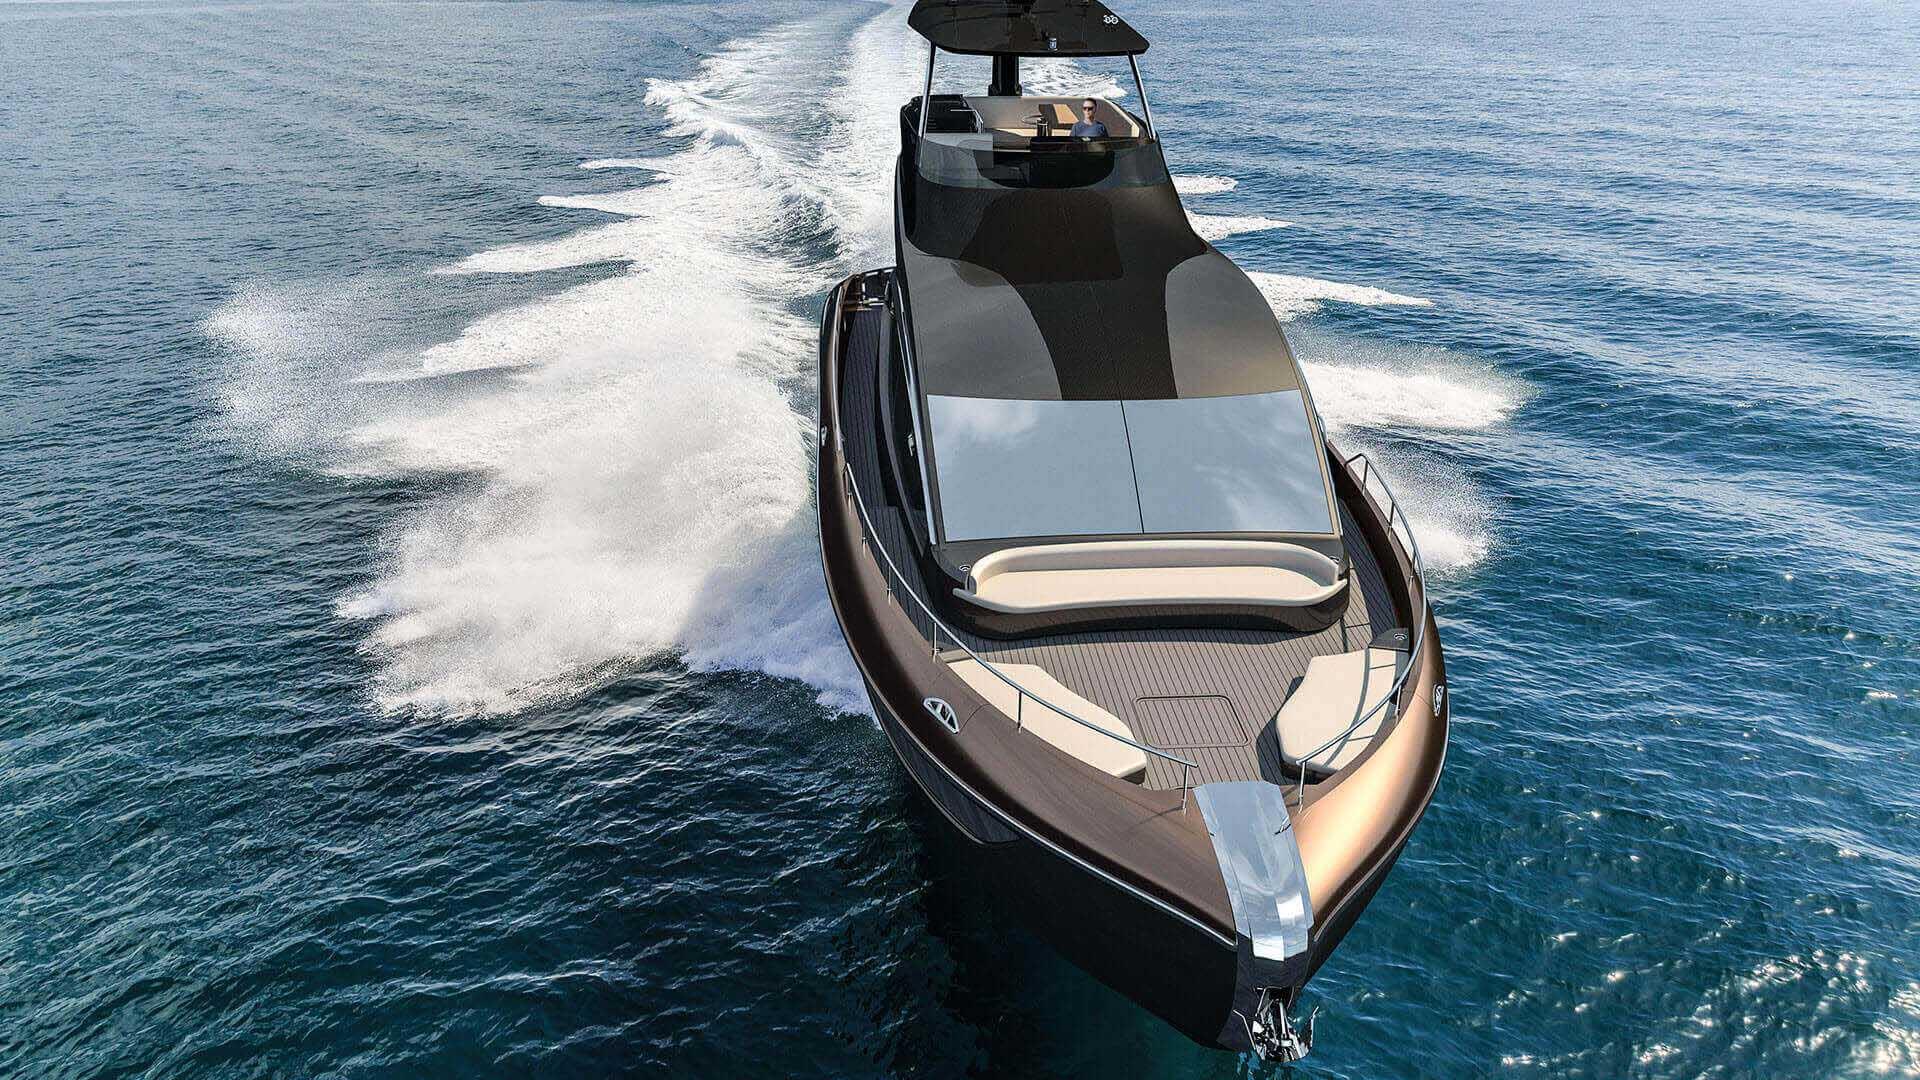 2019 lexus ly 650 luxury yacht gallery 03